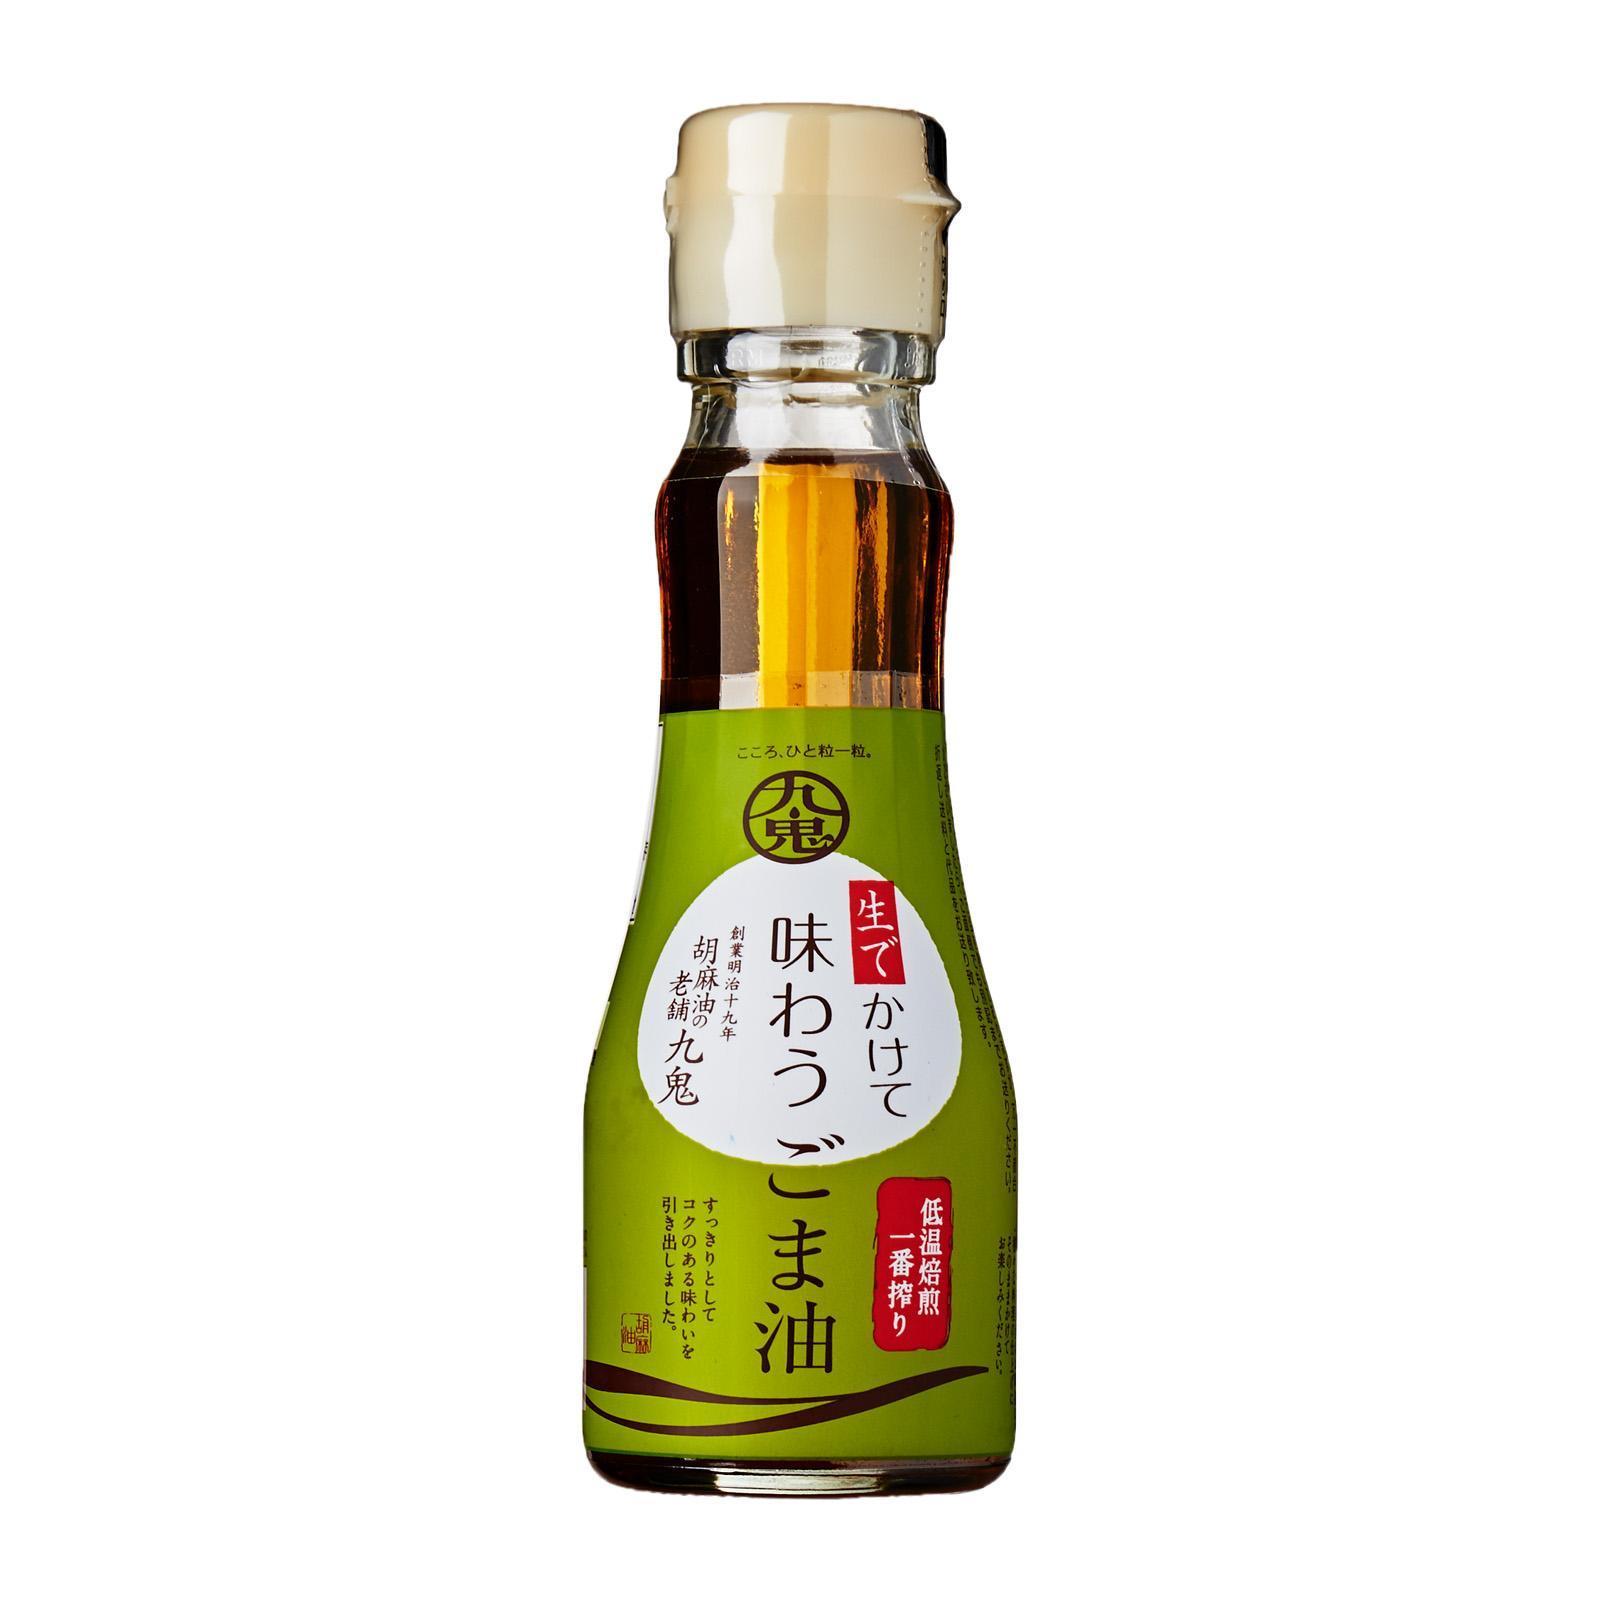 Kuki Namade Kakete Ajiwau Goma Abura Sesame Oil 150ml - Kirei By Redmart.